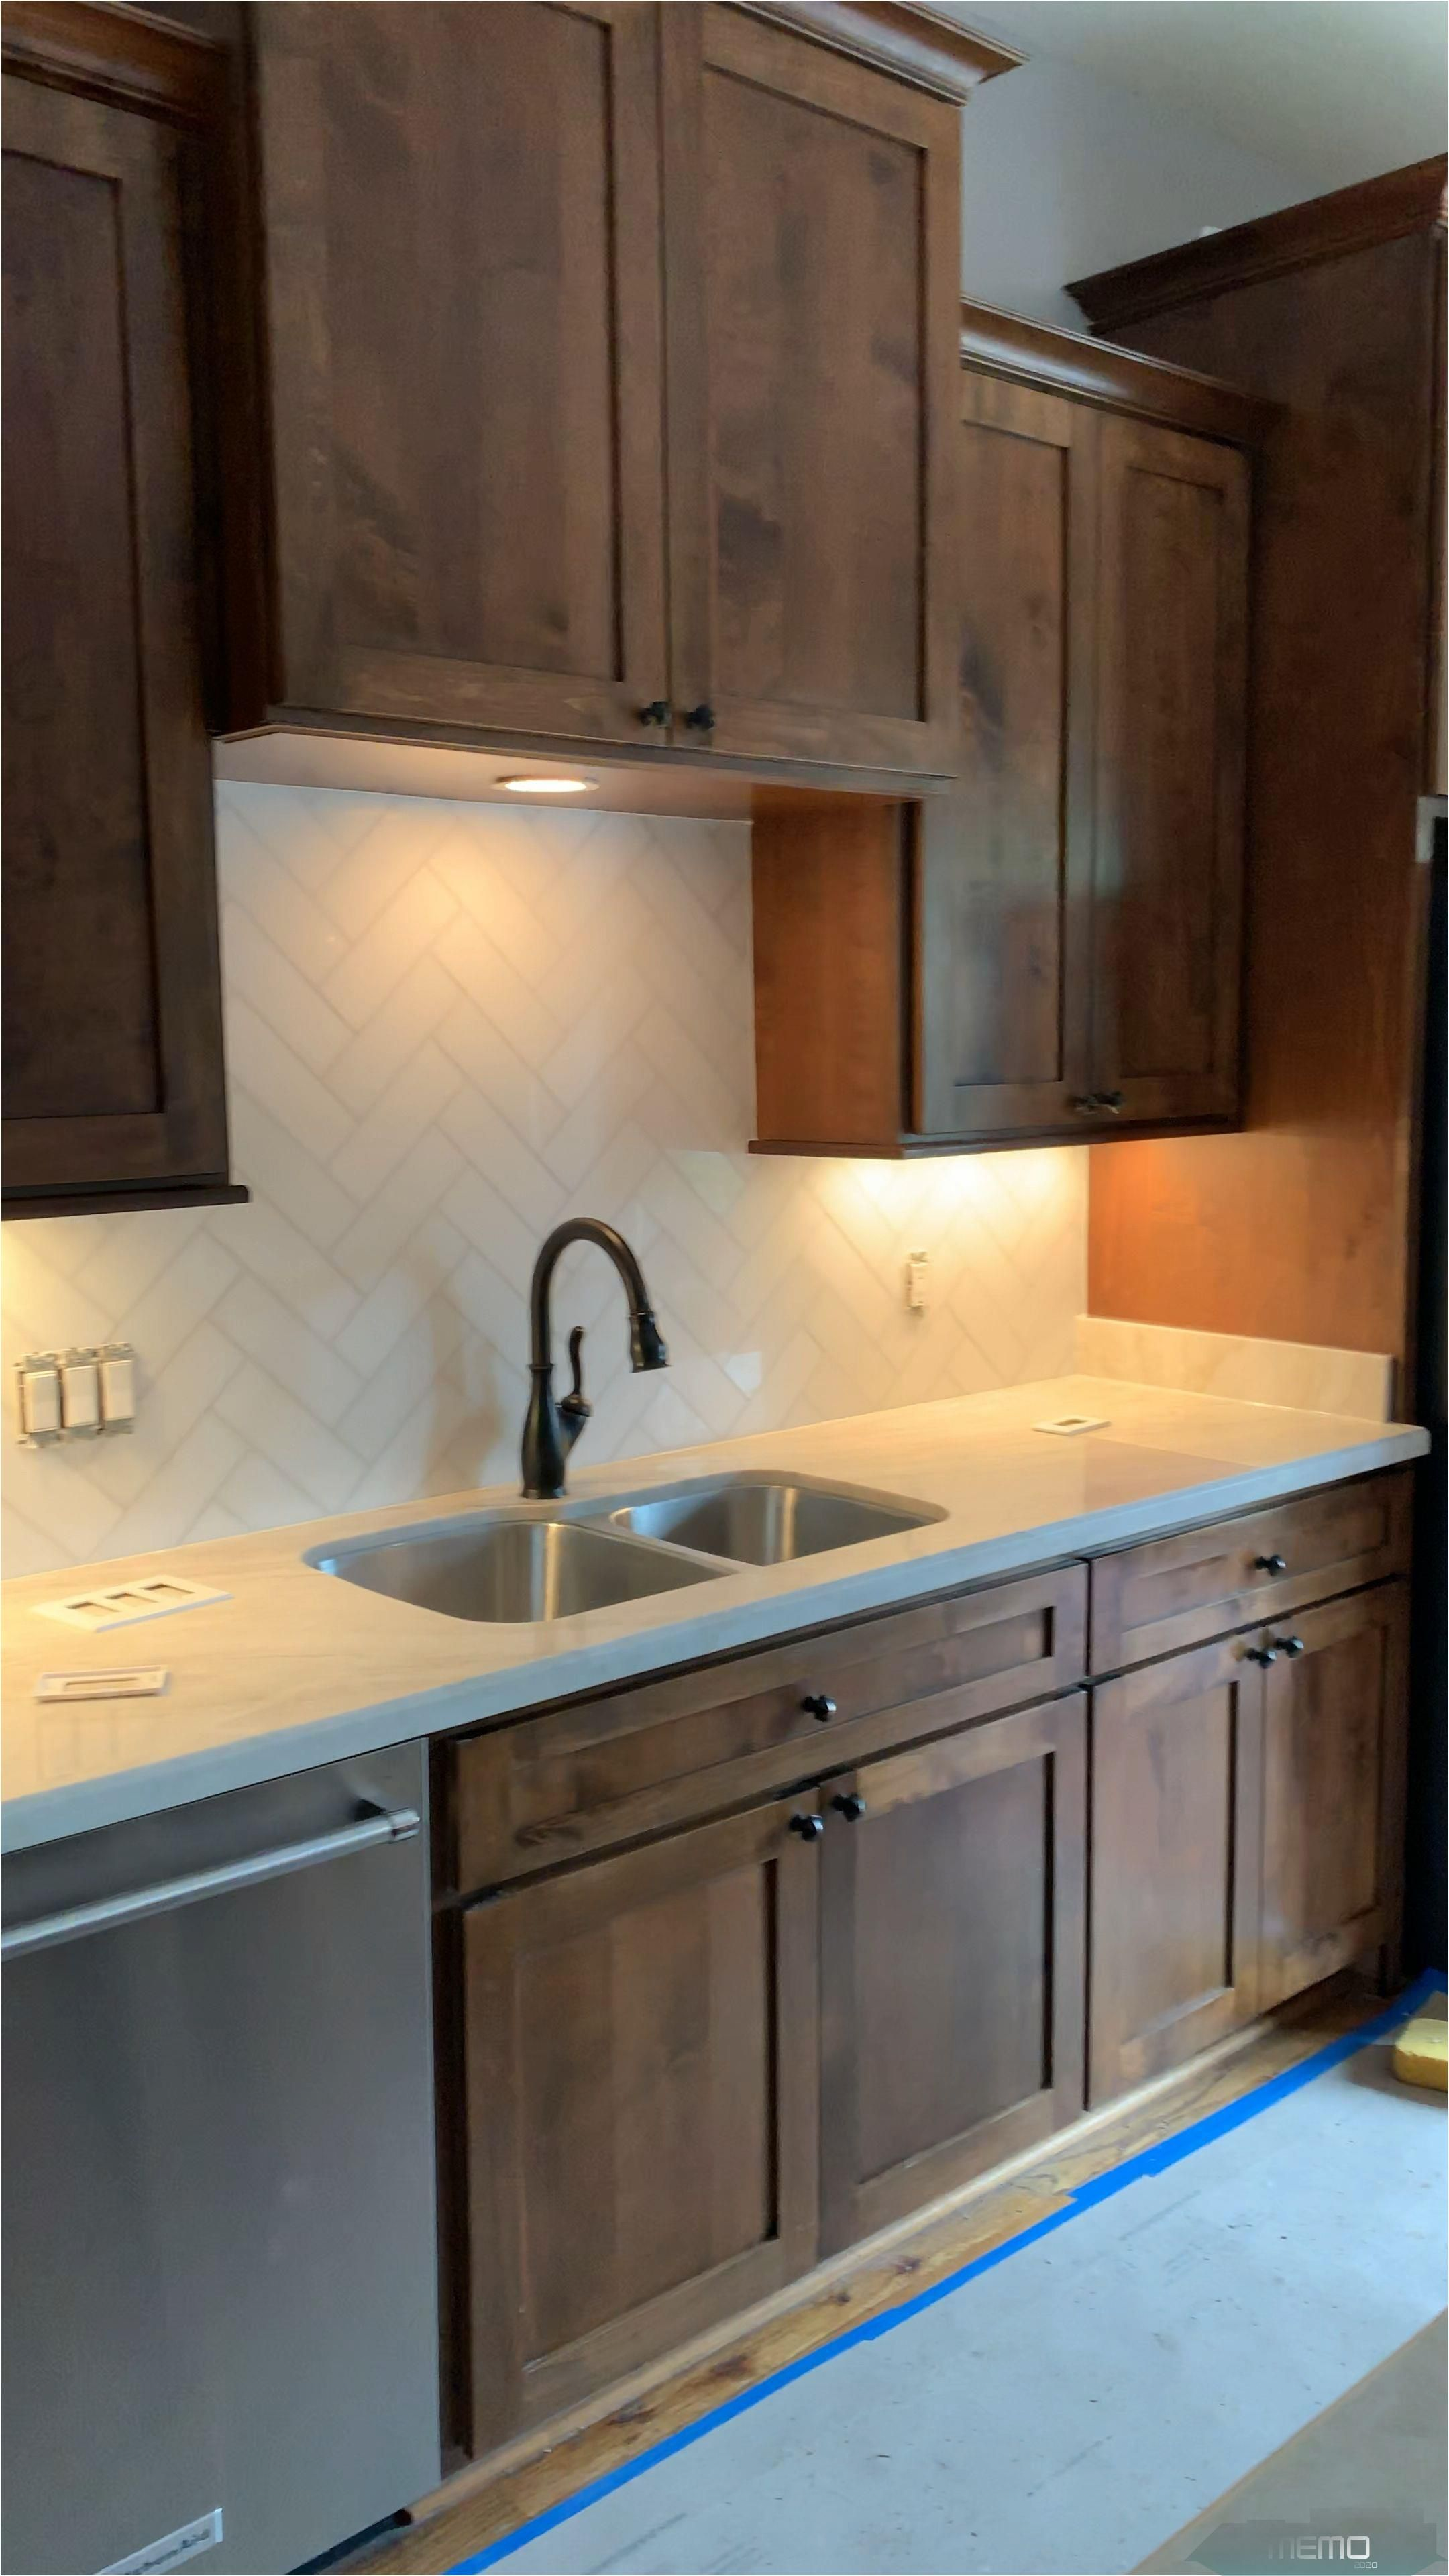 Apr 7 2019 Herringbone Kitchendesign Backsplash Whitemarble Kitchenideas Cabinetsabov In 2020 Rustic Kitchen Backsplash Rustic Kitchen Rustic Farmhouse Kitchen